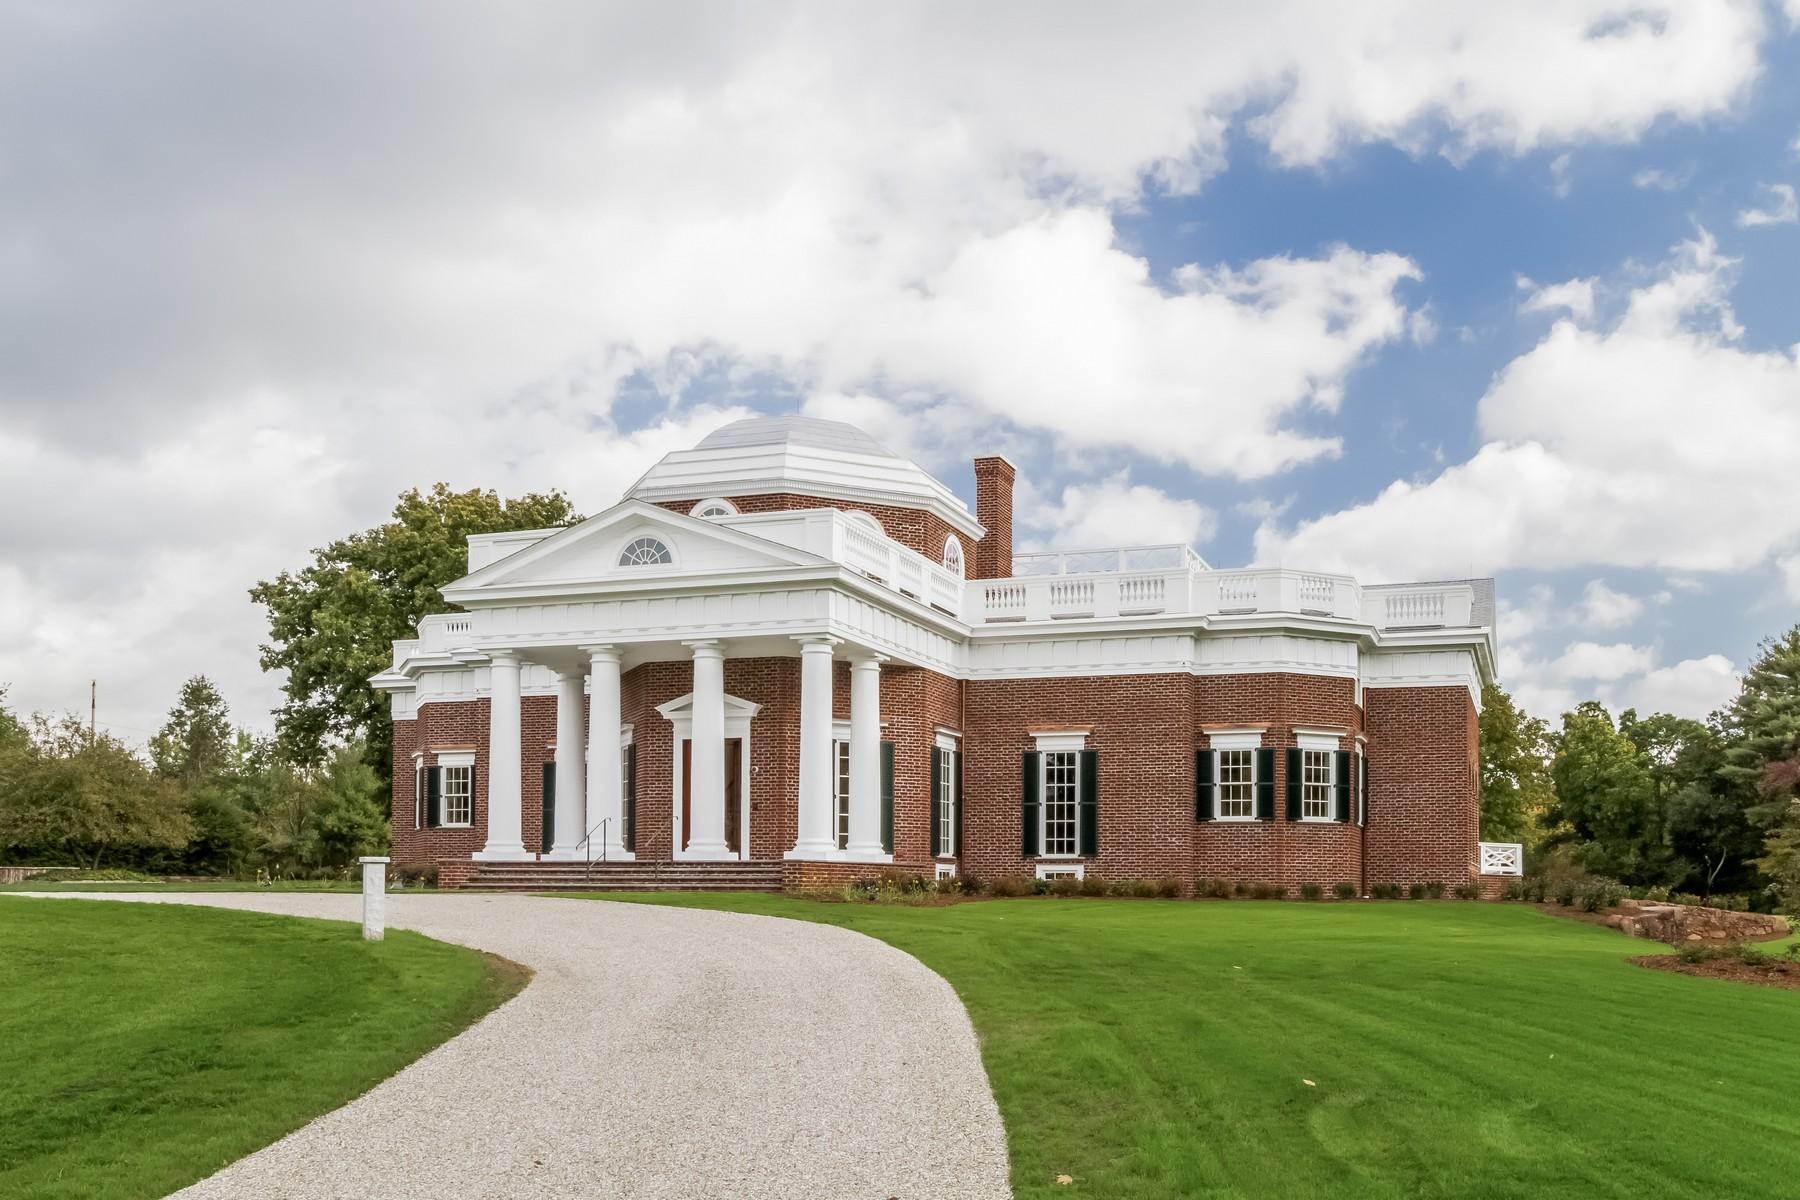 Moradia para Venda às The New Monticello 732 Hall Hill Road Somers, Connecticut 06071 Estados Unidos